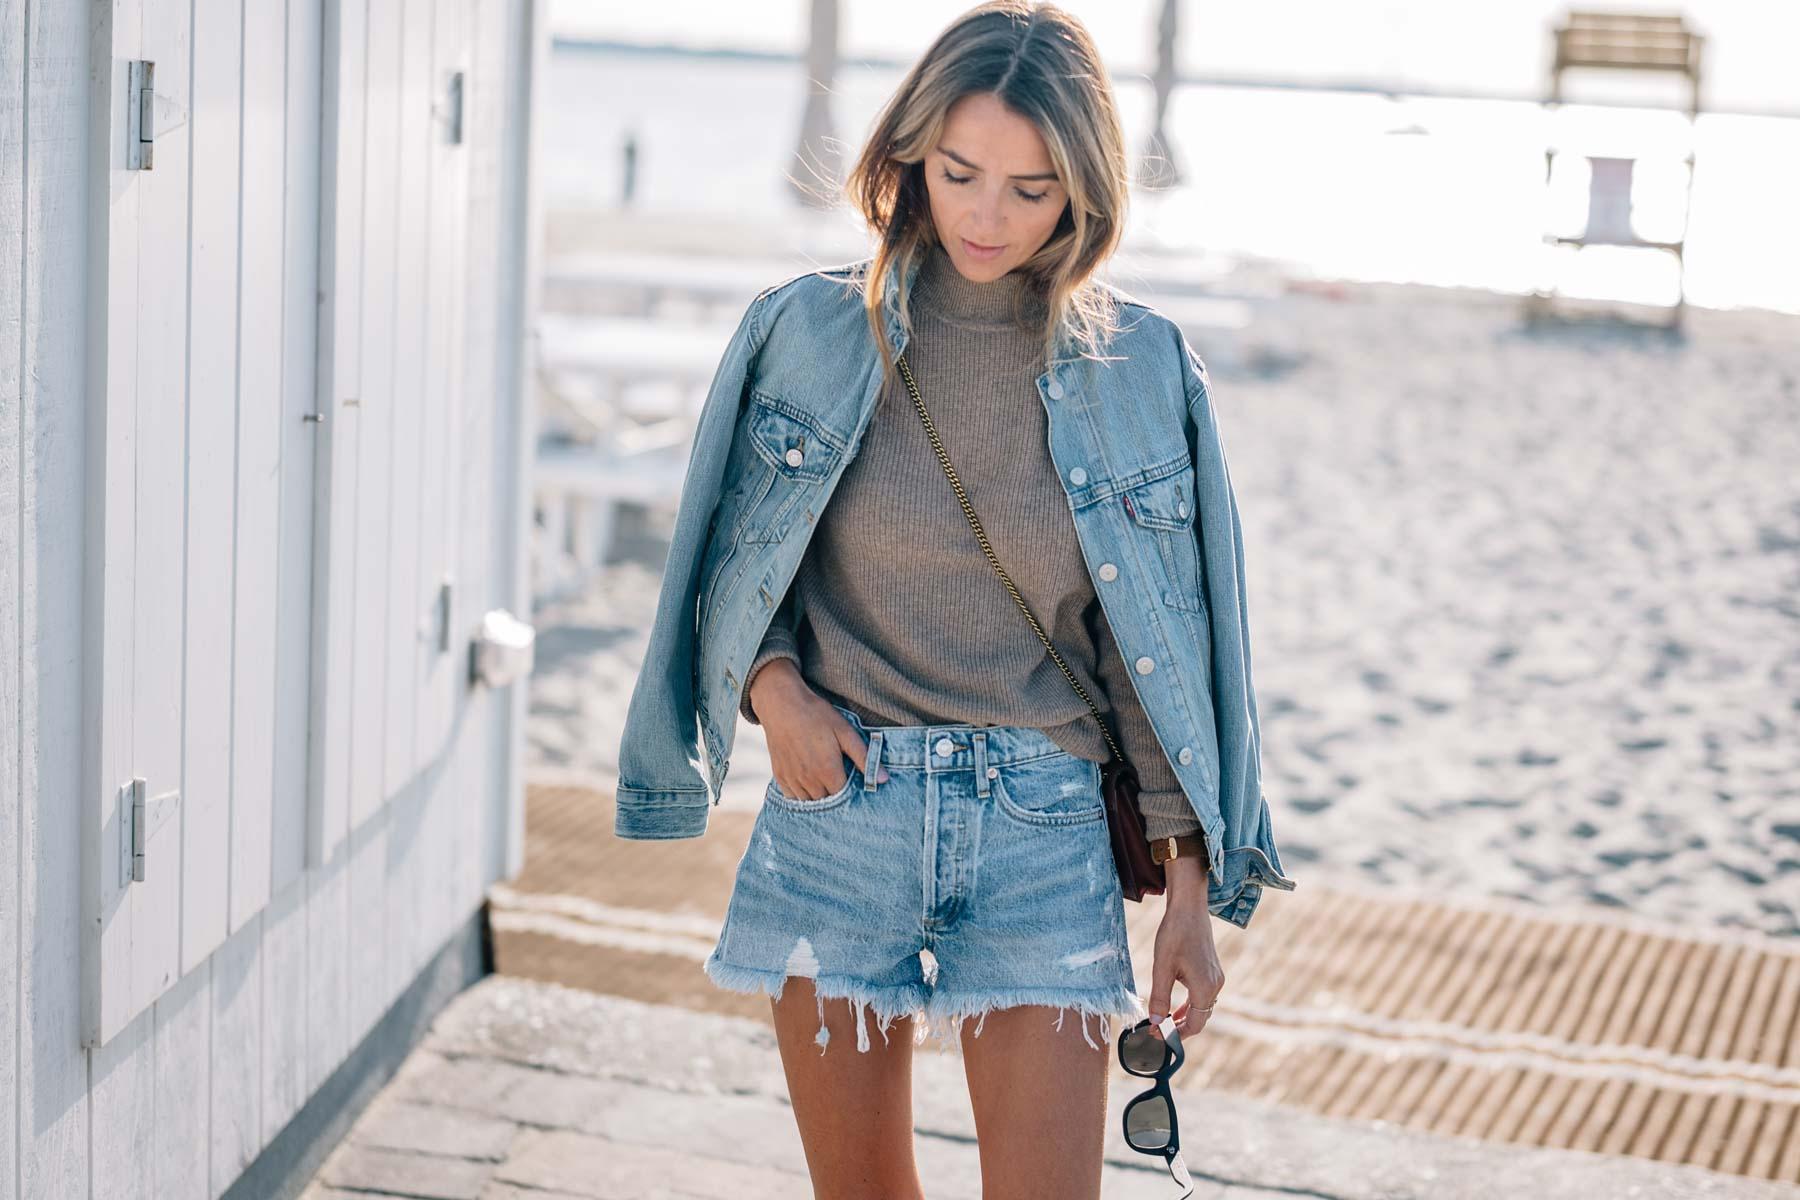 Jess Kirby wears the levis ex boyfriend trucker denim jacket, cashmere sweater and denim shorts